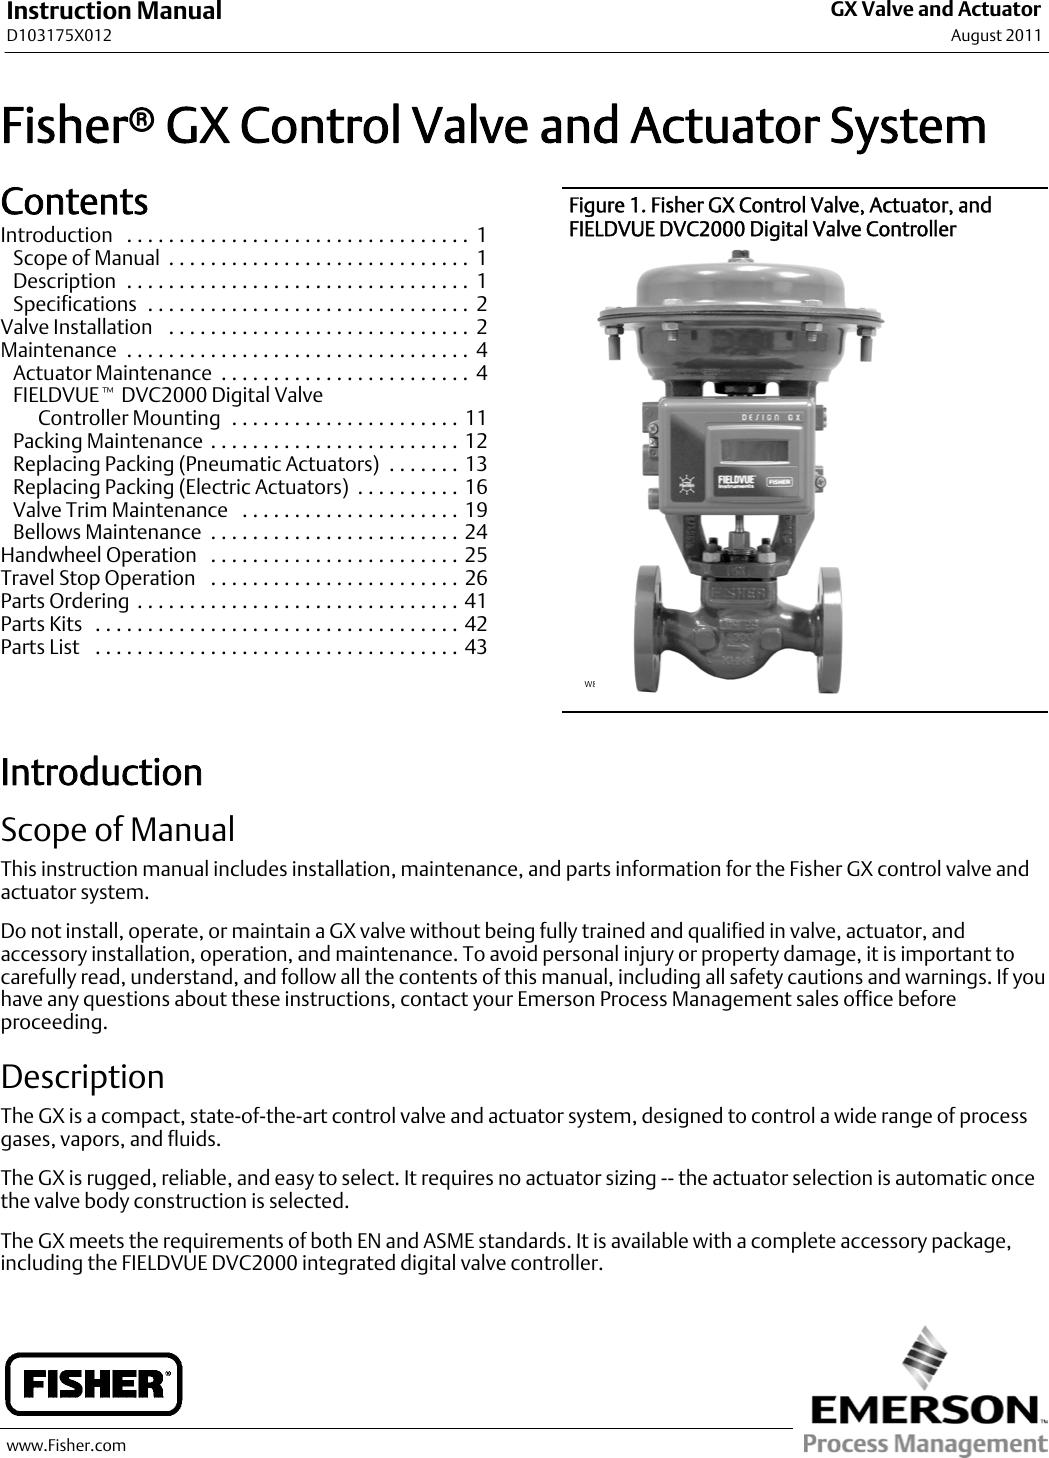 Jet 456612 Parts List Manual Guide